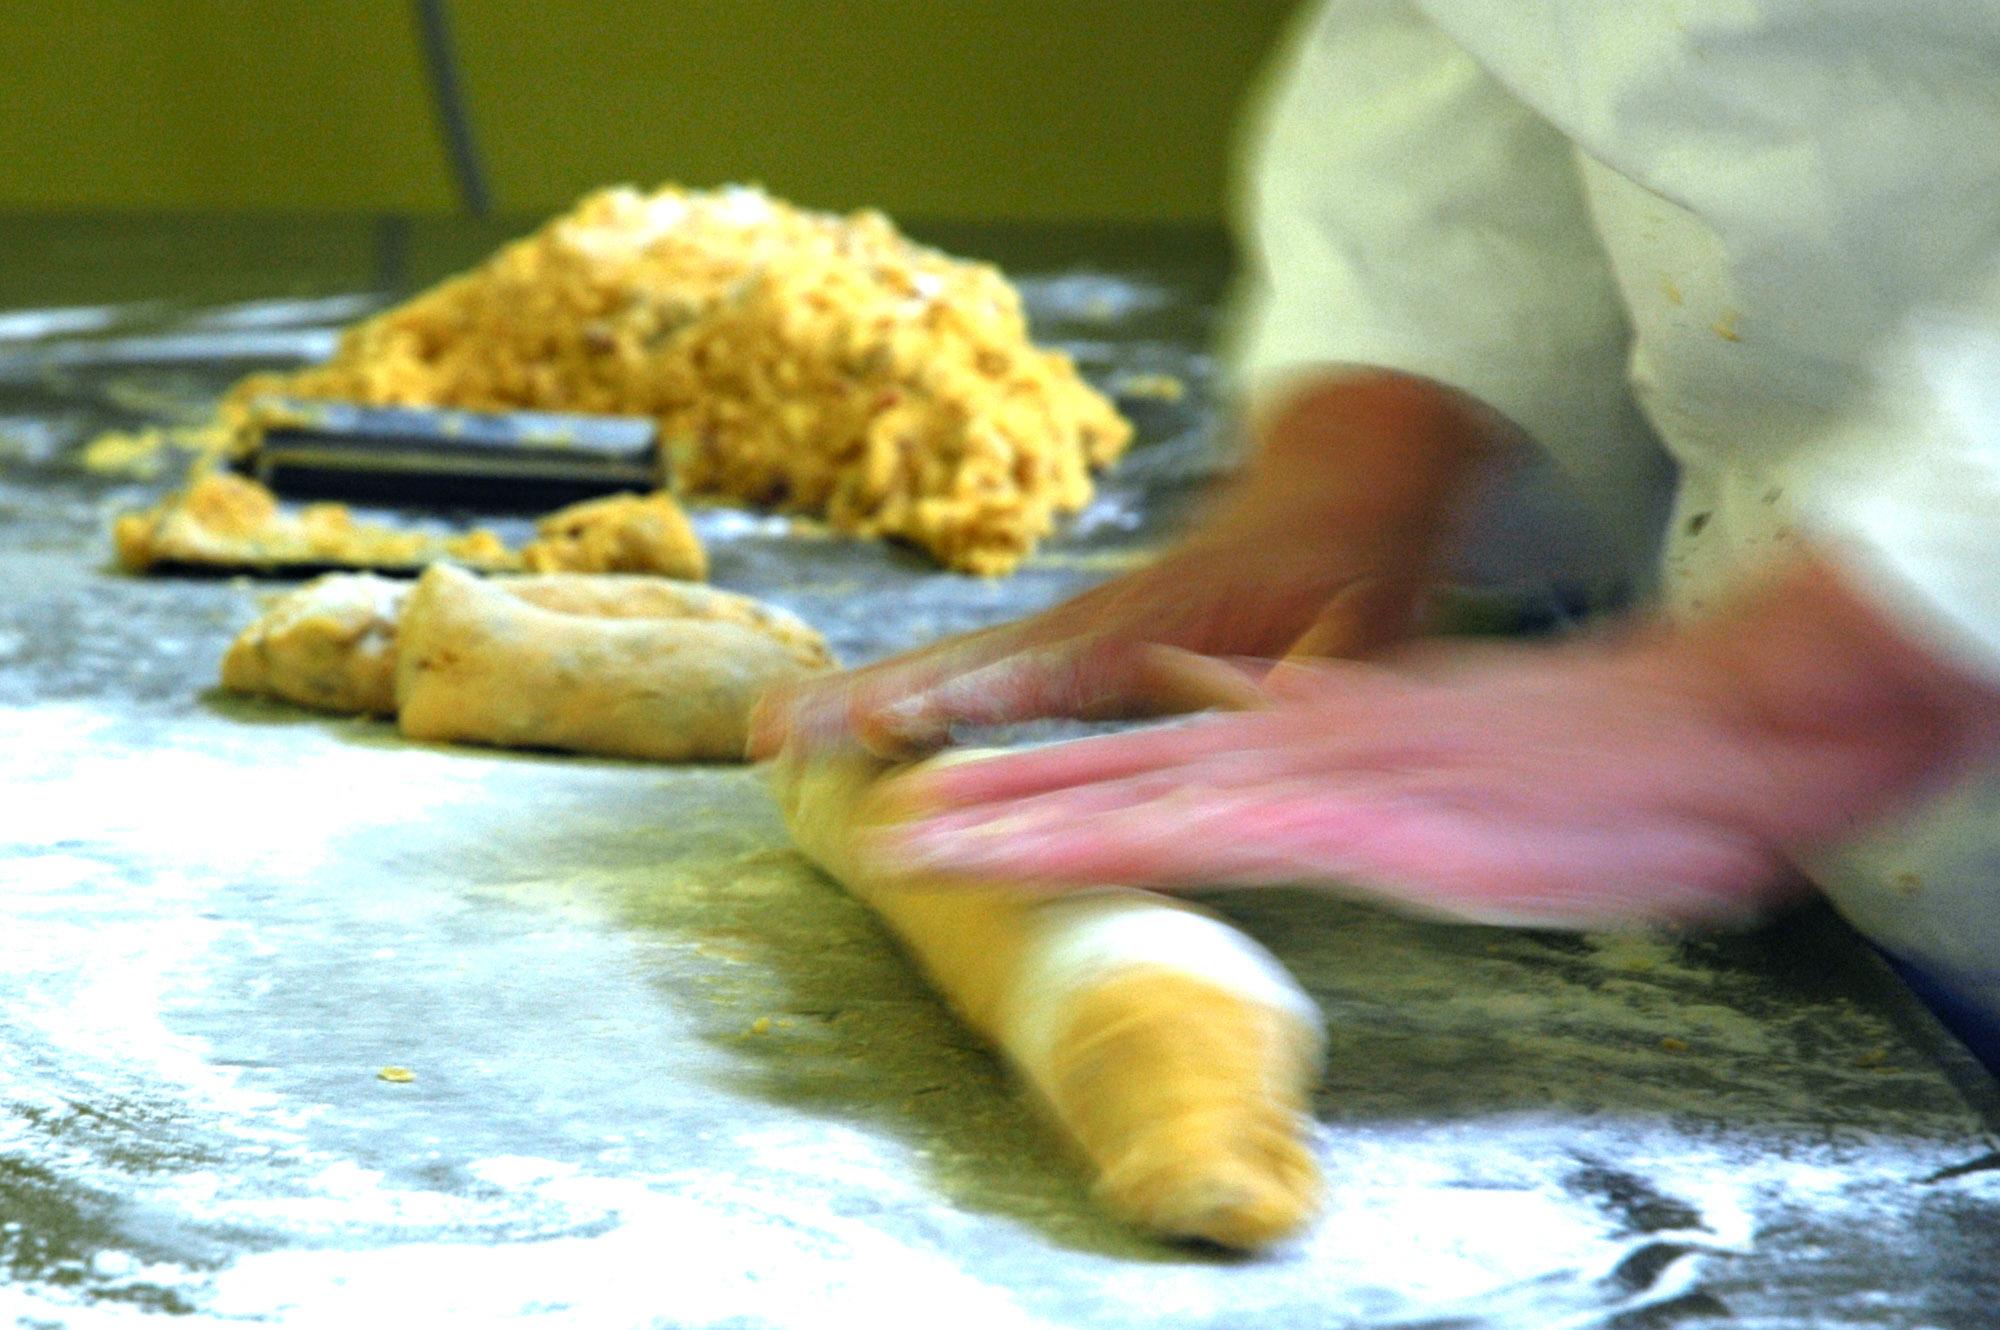 Cantucci bakken op ambachtelijke wijze ICantucci.it Pany da Lory Florence Italië